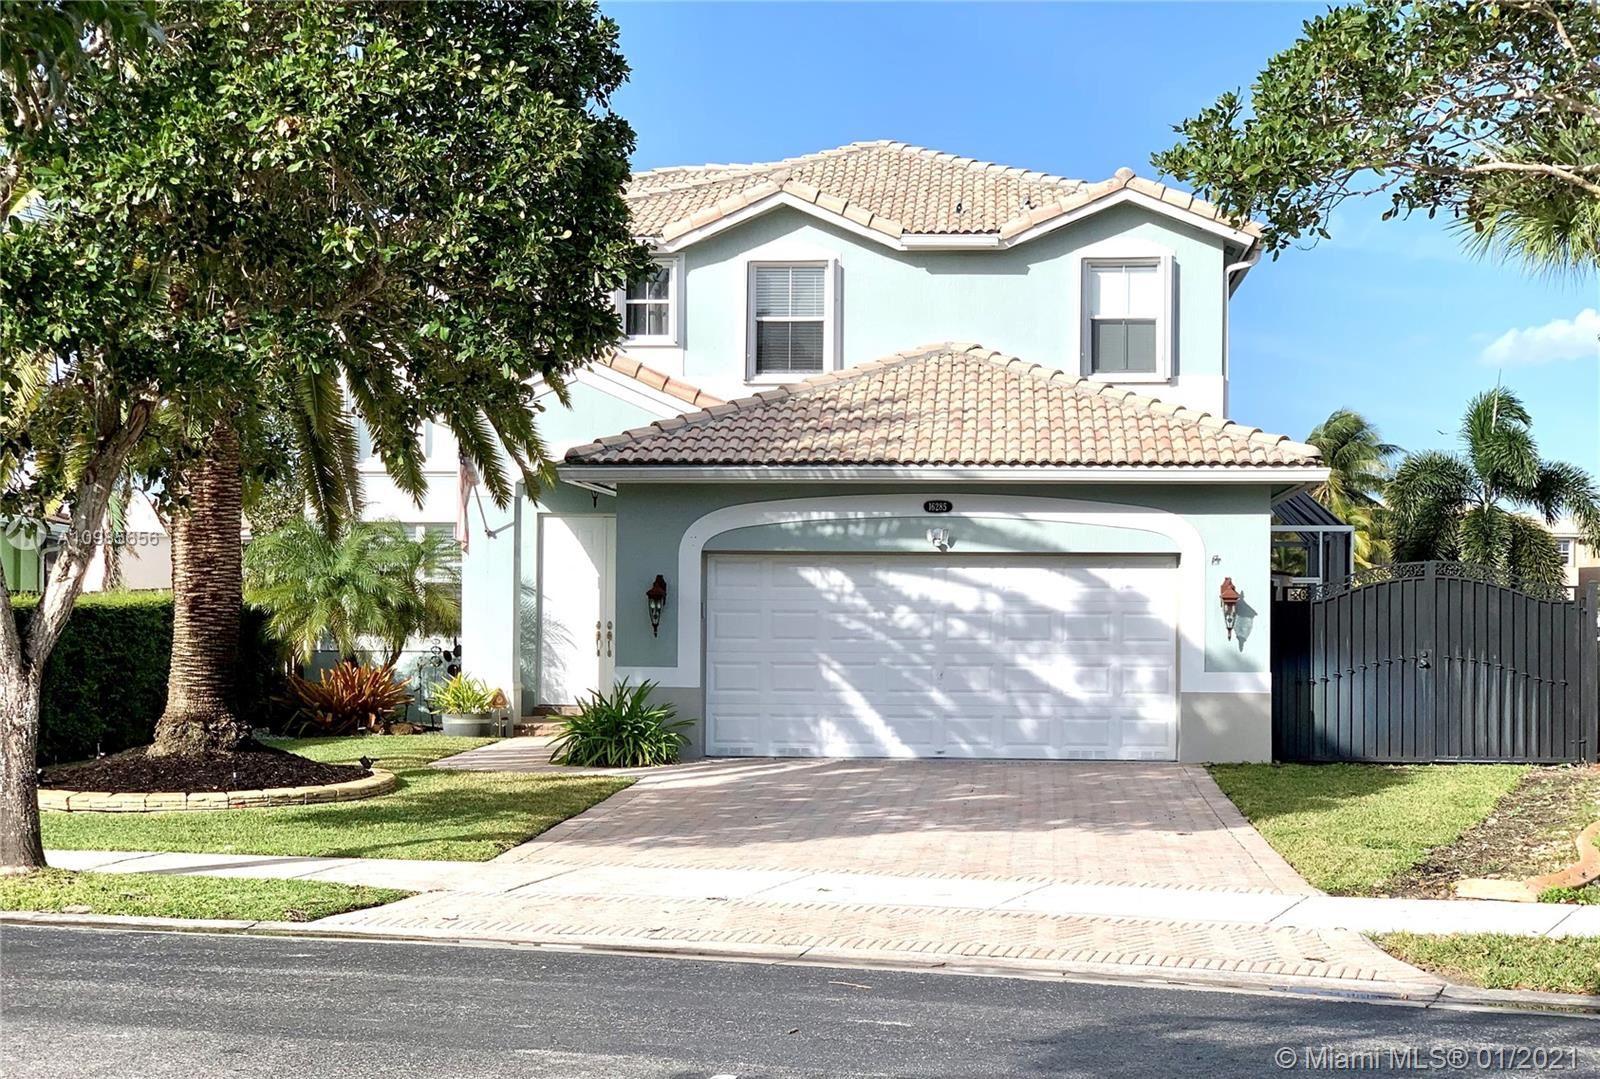 Photo of 16285 SW 44th St, Miami, FL 33185 (MLS # A10985656)